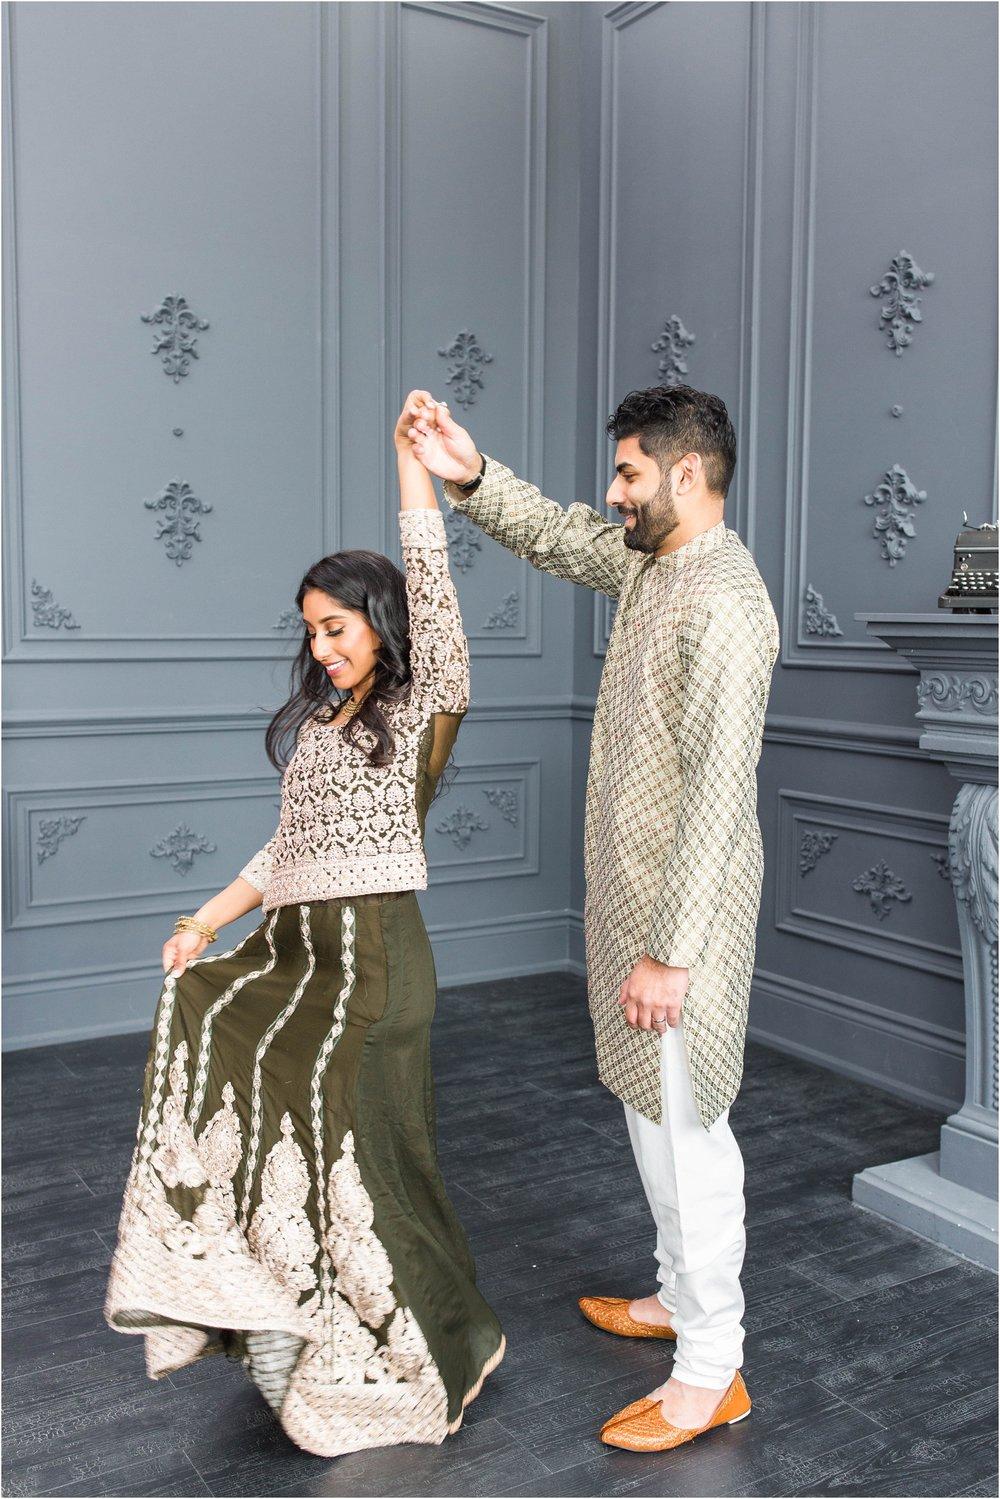 Mint-Room-Studios-Anniversary-Session-Toronto-Mississauga-Brampton-Scarborough-GTA-Pakistani-Indian-Wedding-Engagement-Photographer-Photography_0031.jpg